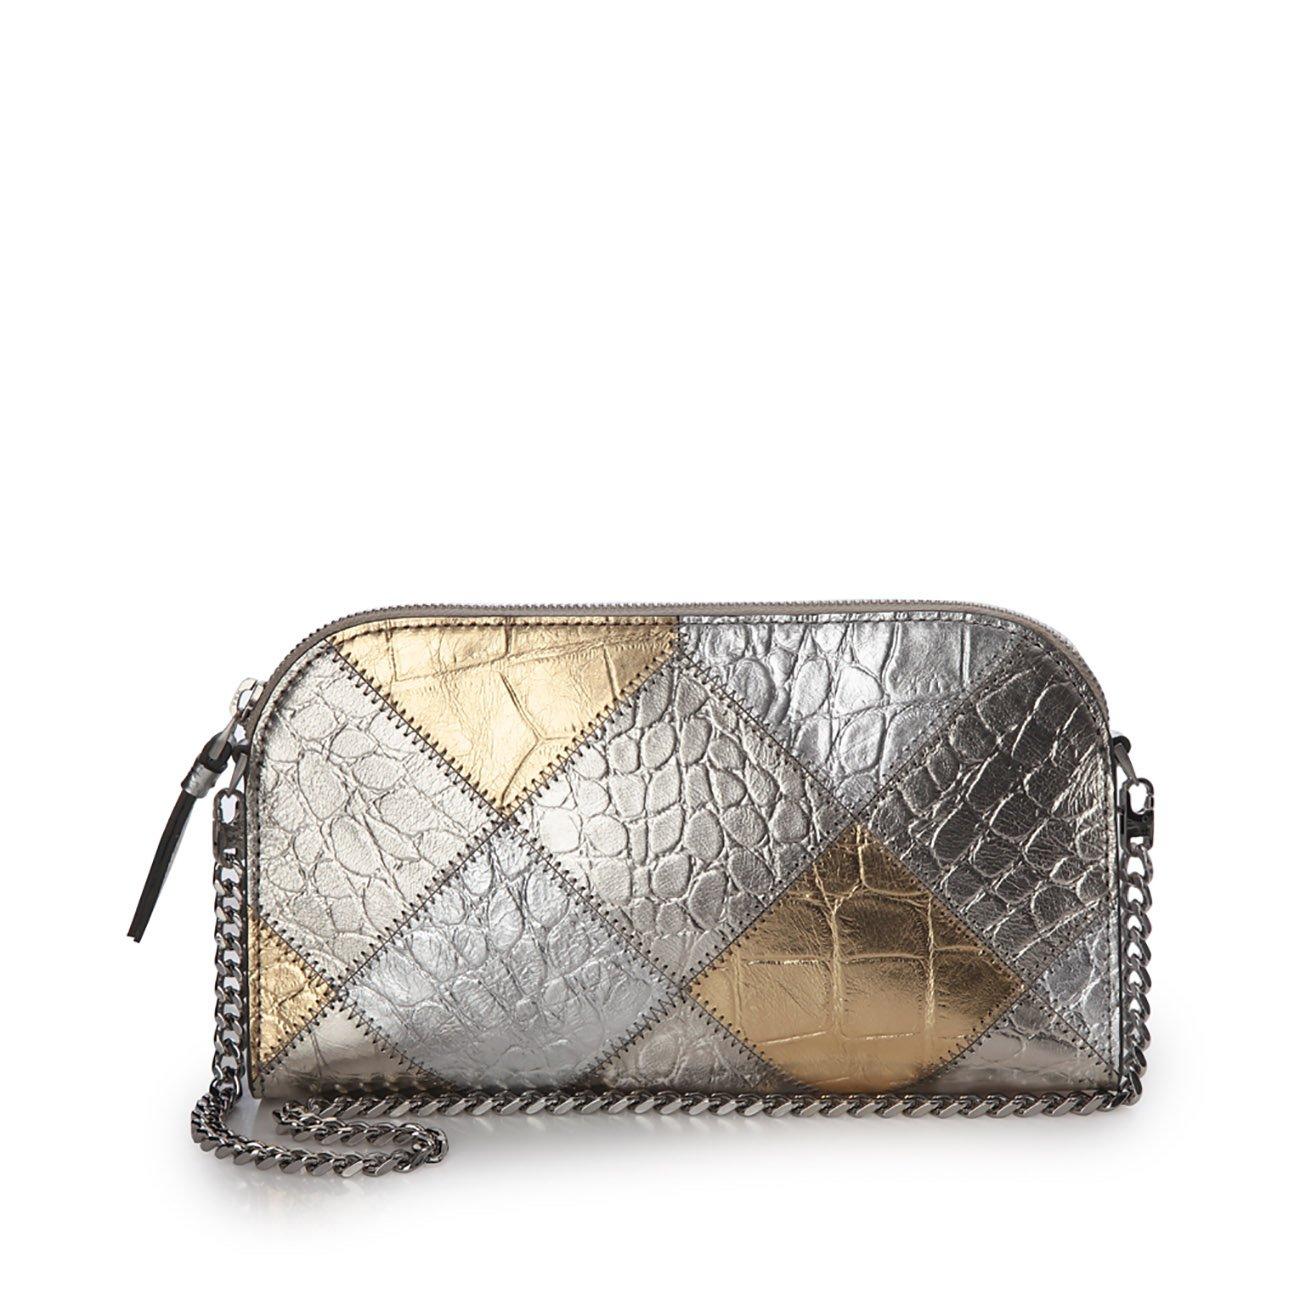 Eric Javits Luxury Fashion Designer Women's Handbag - Patchwork Pouch - Gold/Silver